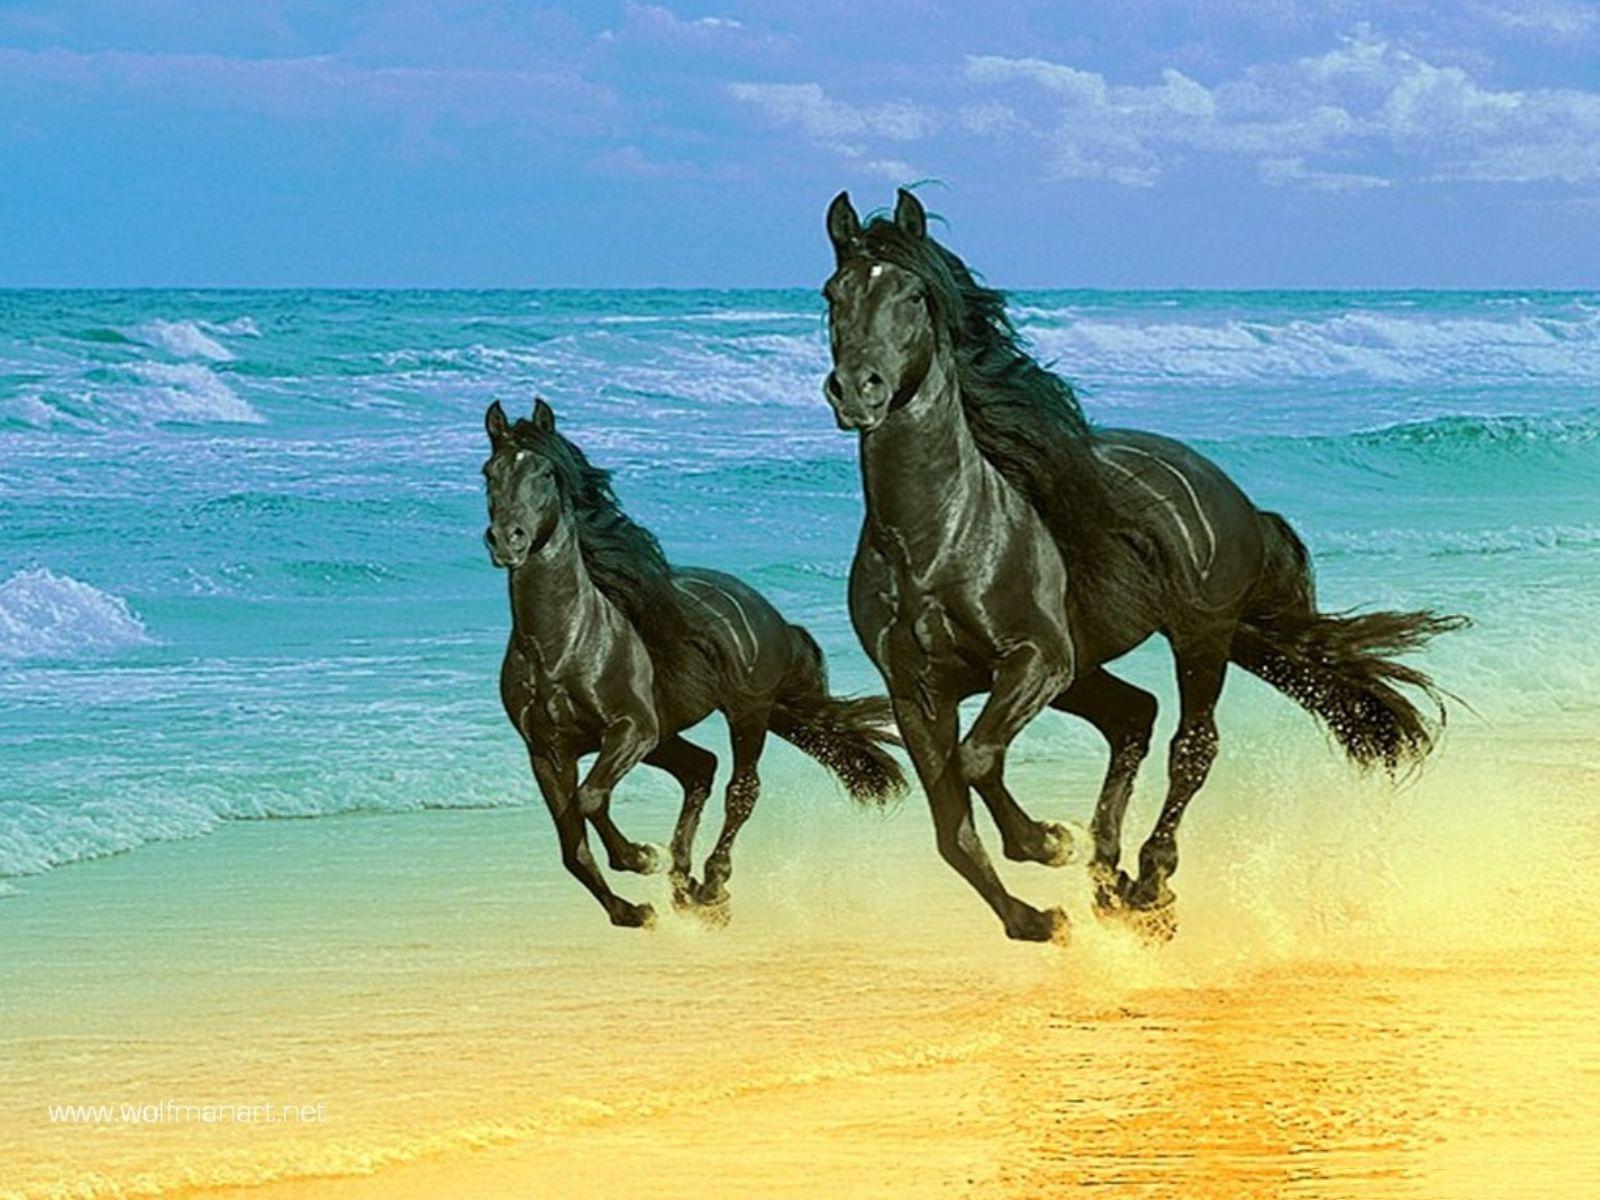 Black Horses Wallpapers